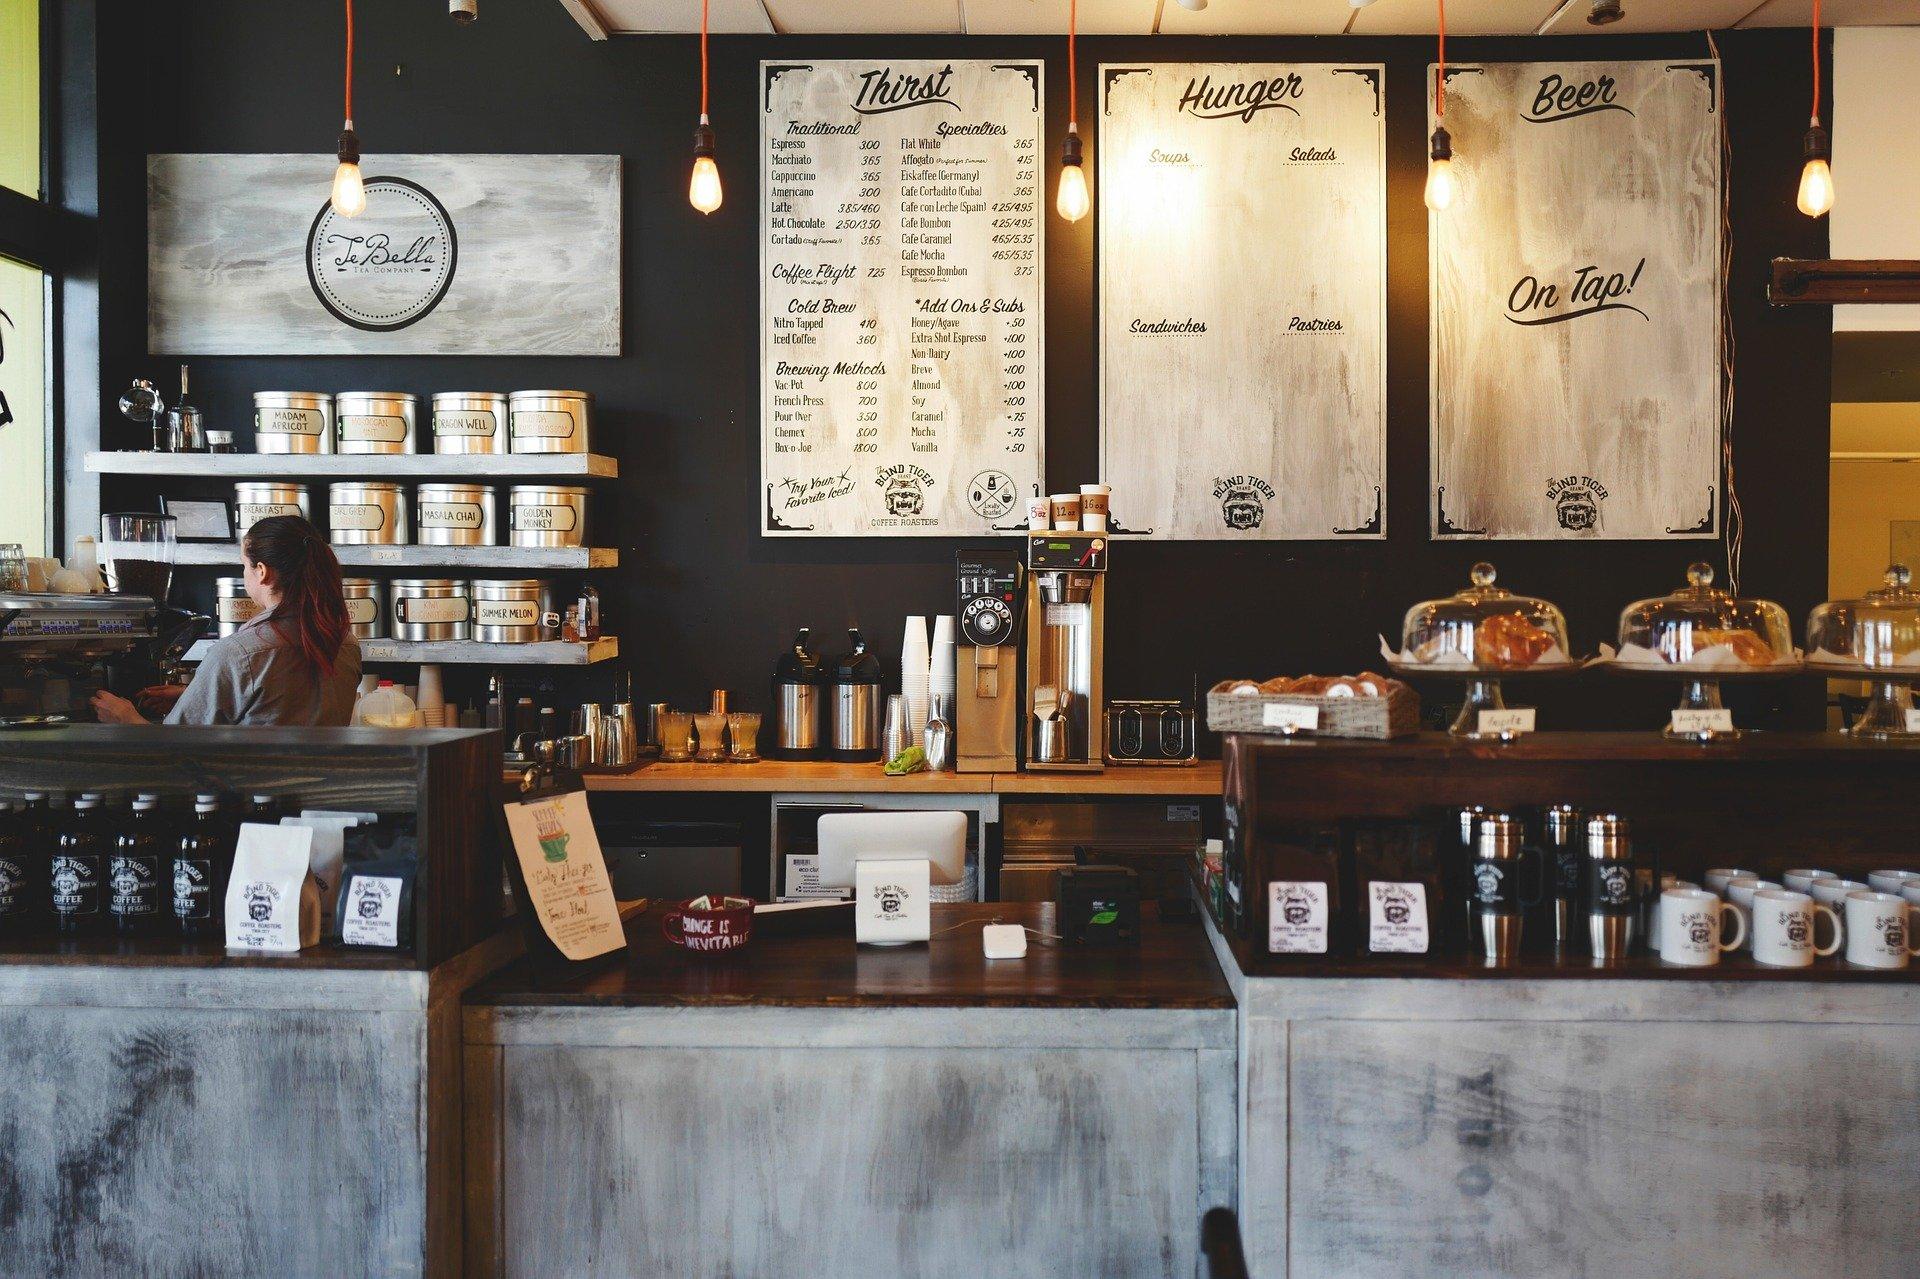 Menu Board in Coffee Shop